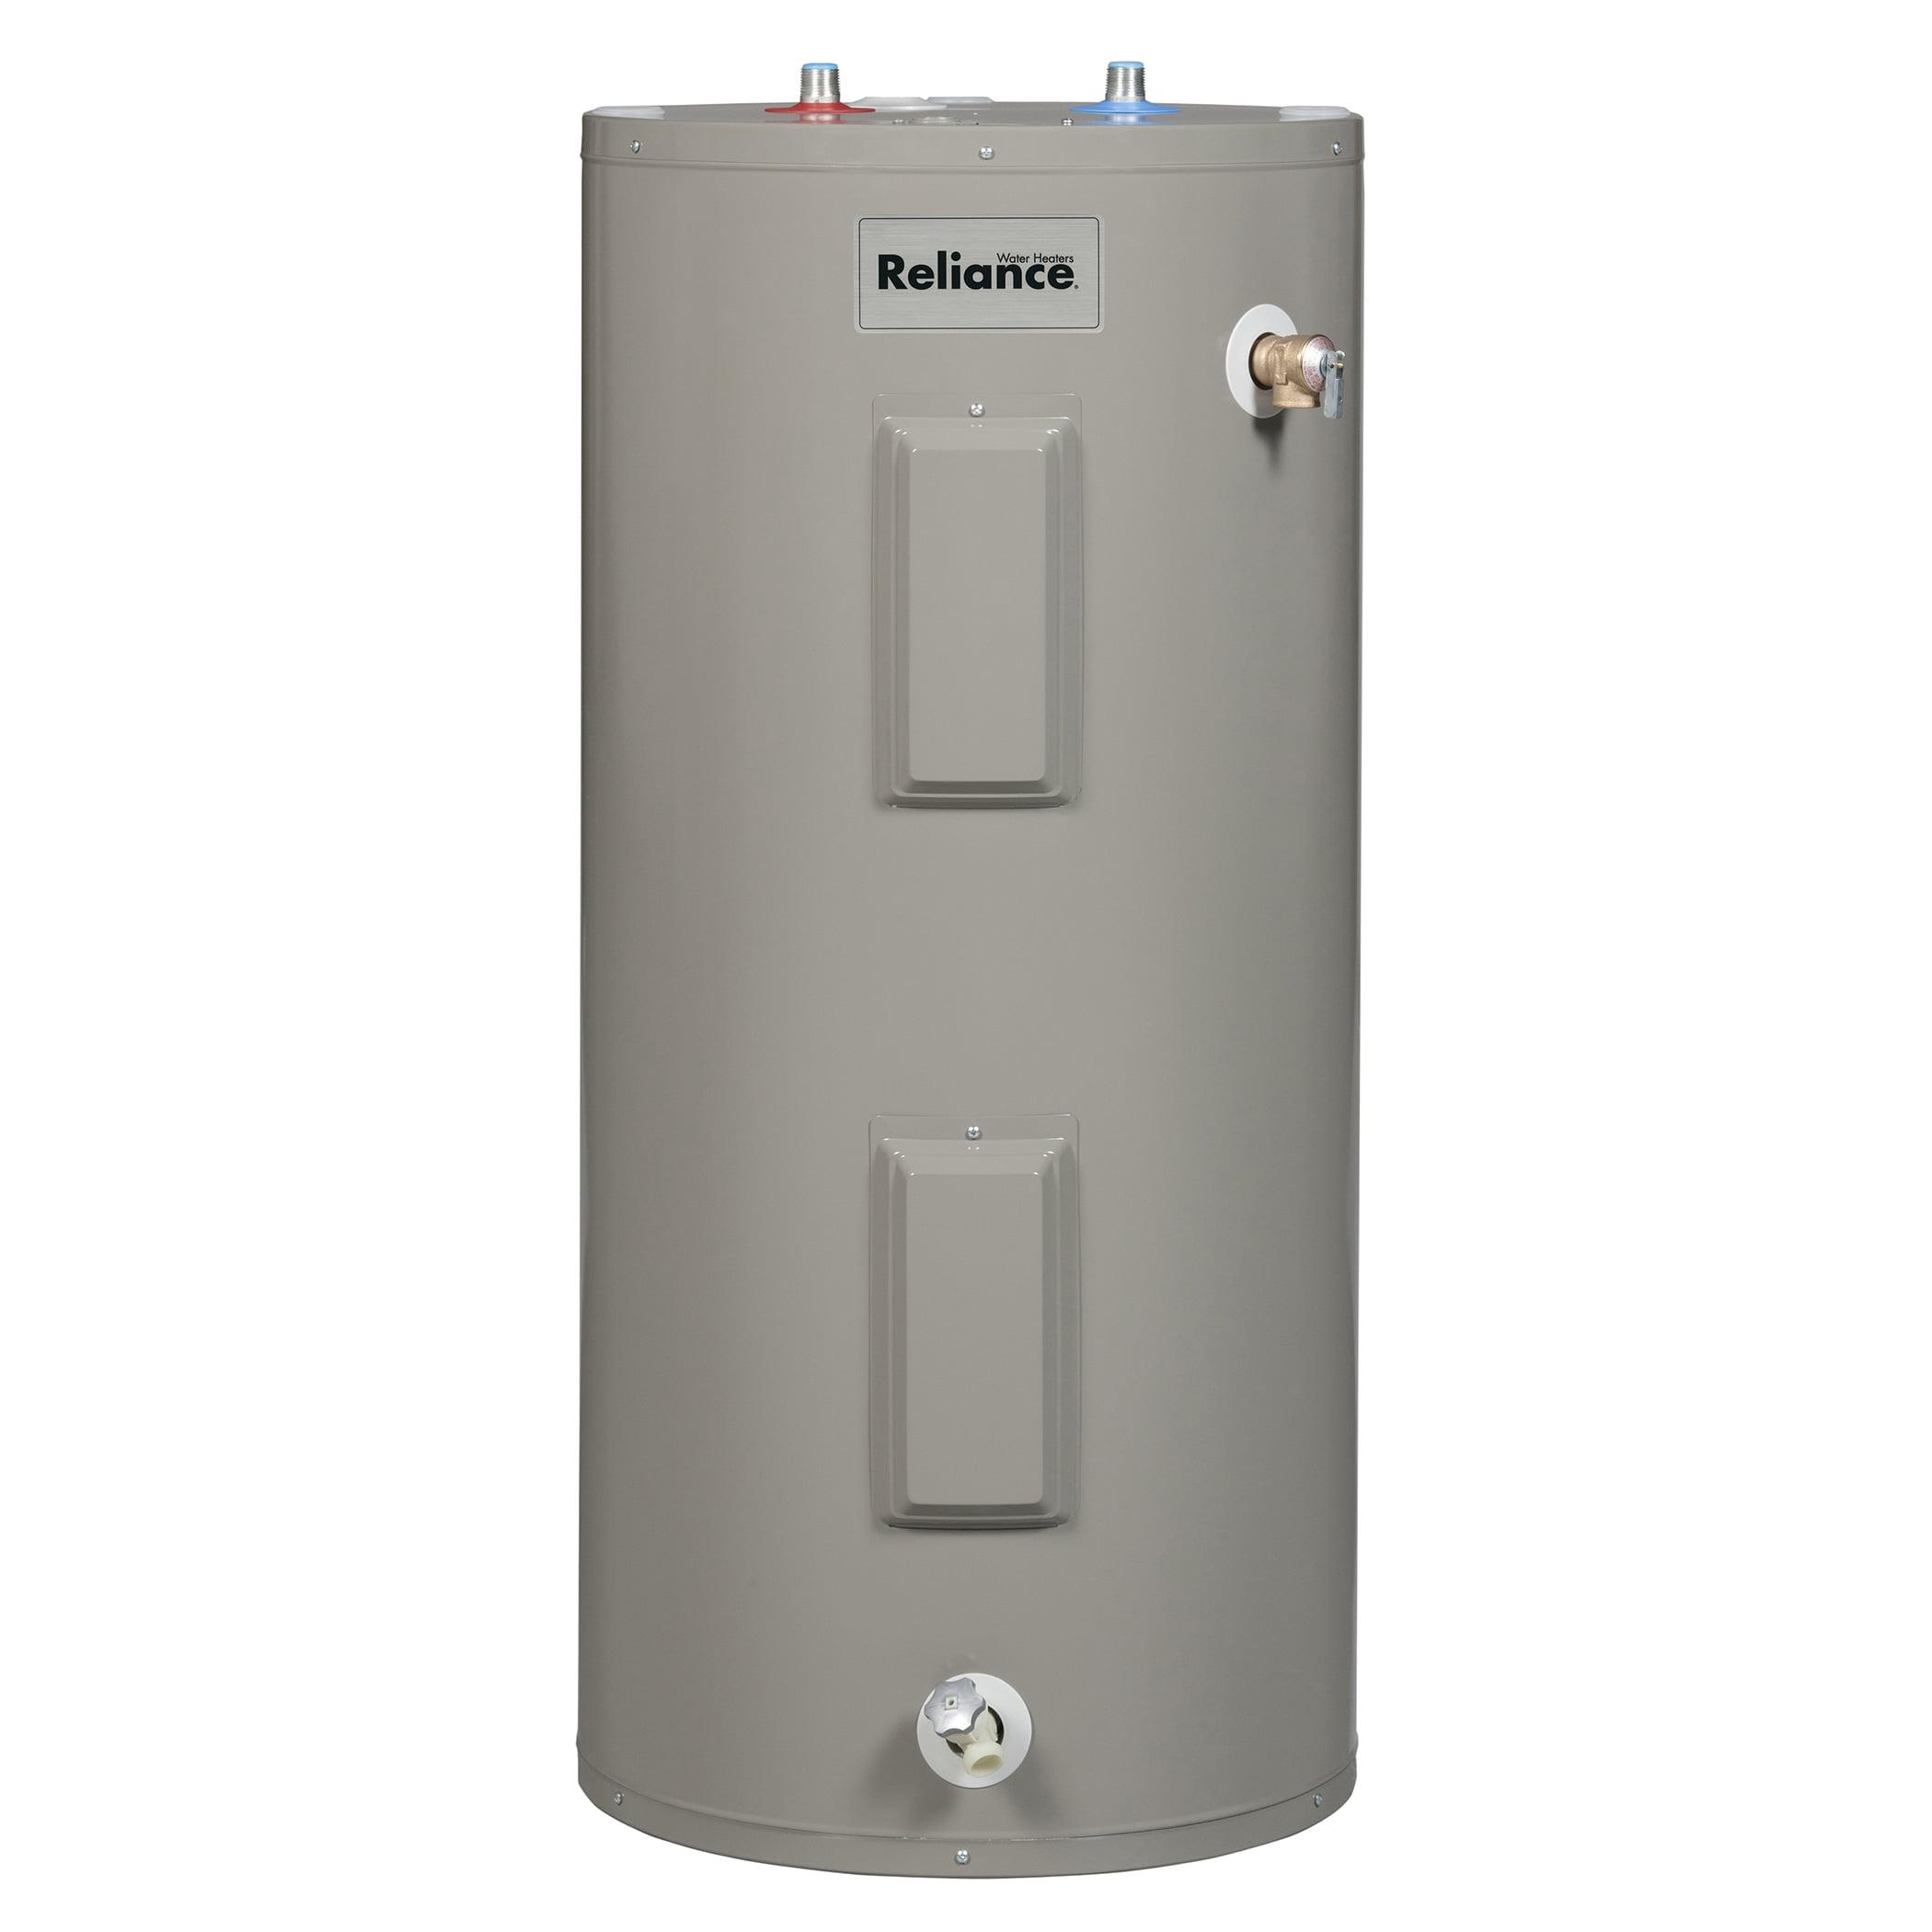 Reliance 6 30 EORS 30 Gallon Electric Medium Water Heater